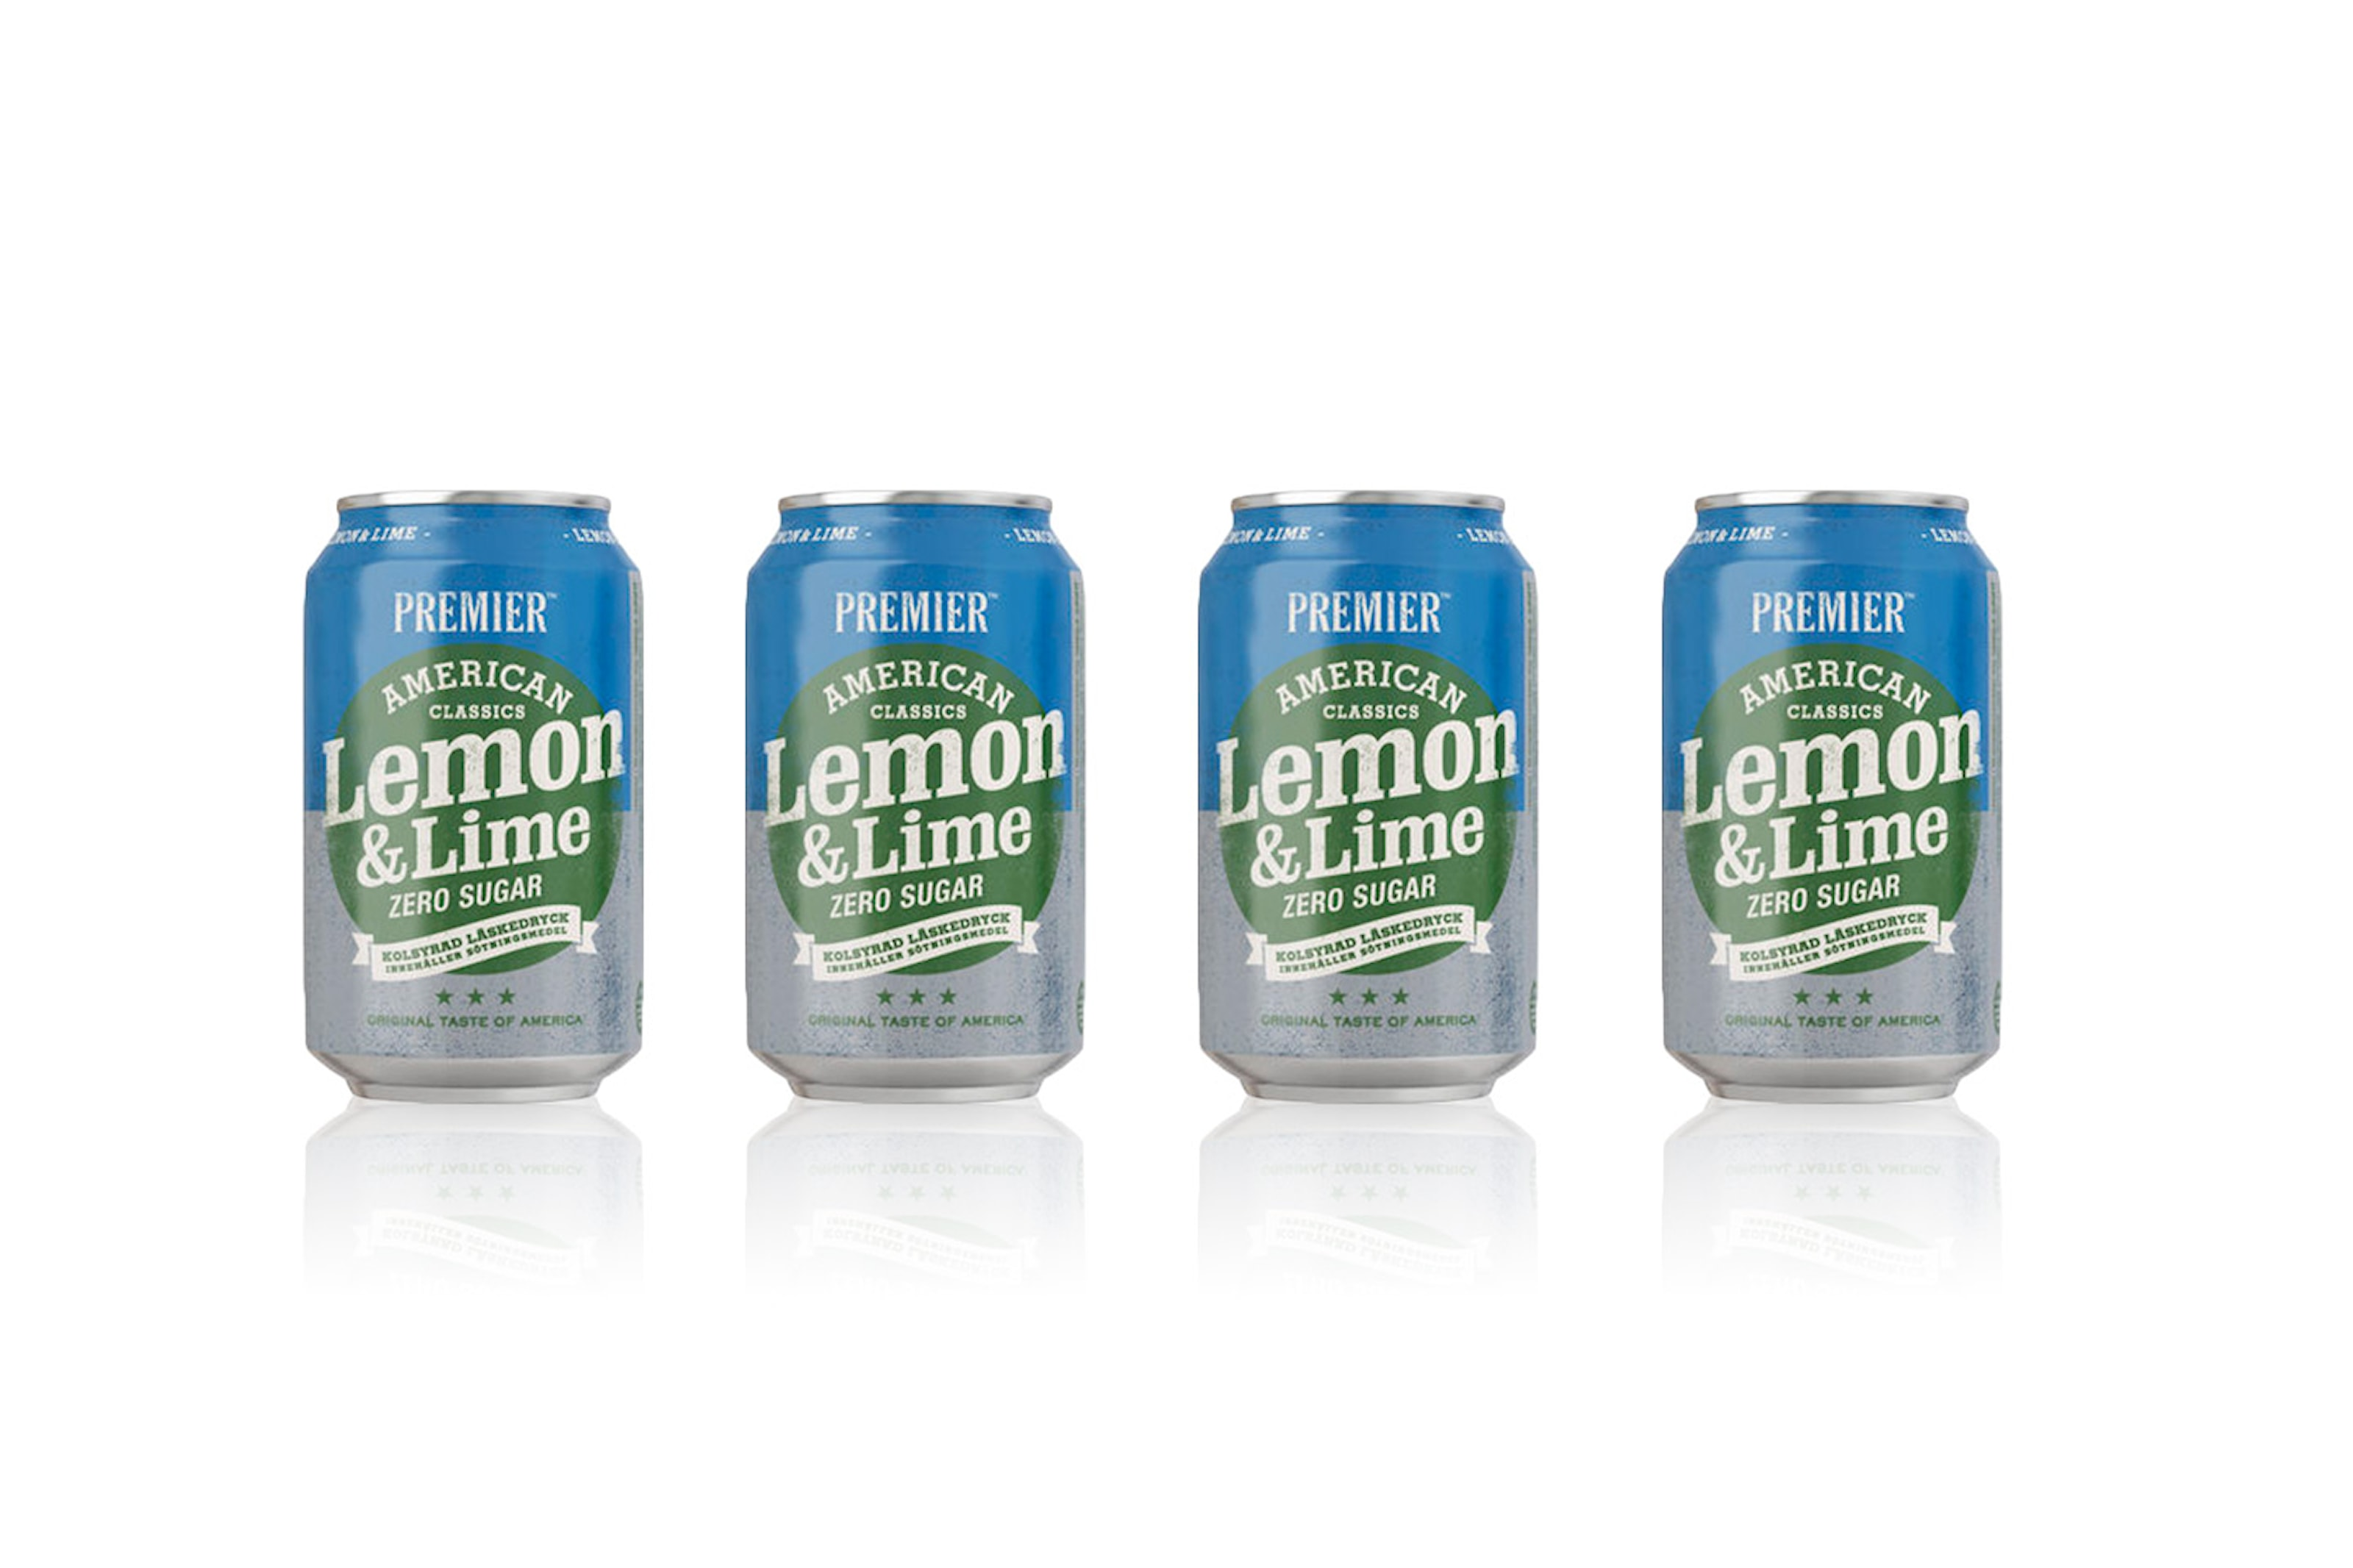 18-pack Premier Lemon & Lime Zero Sugar